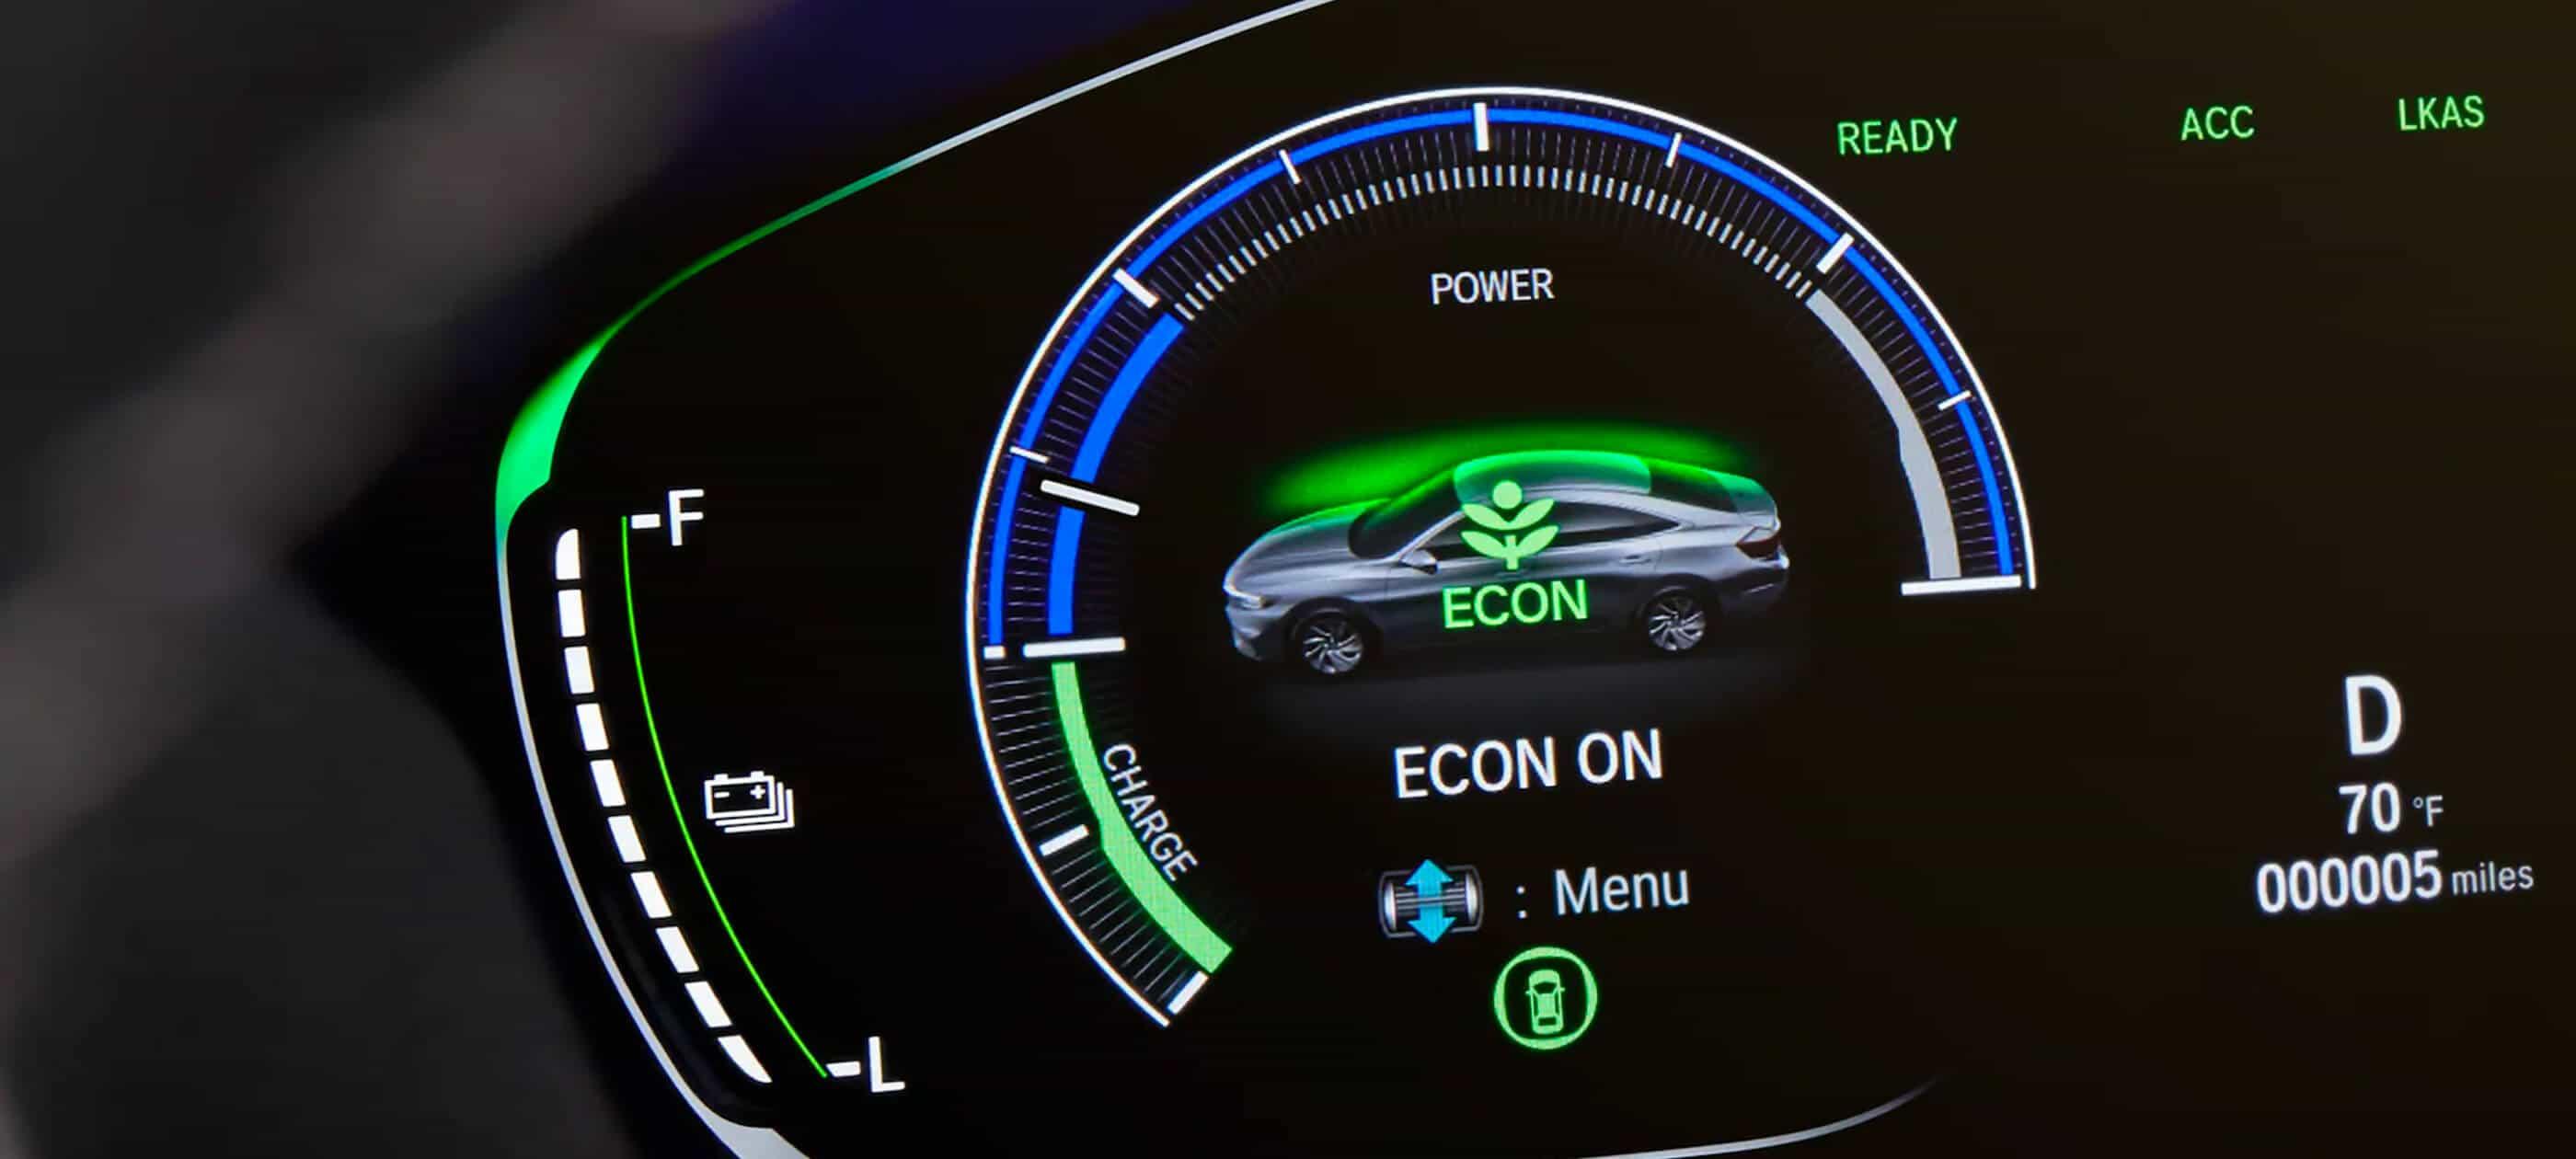 ECON Drive Mode